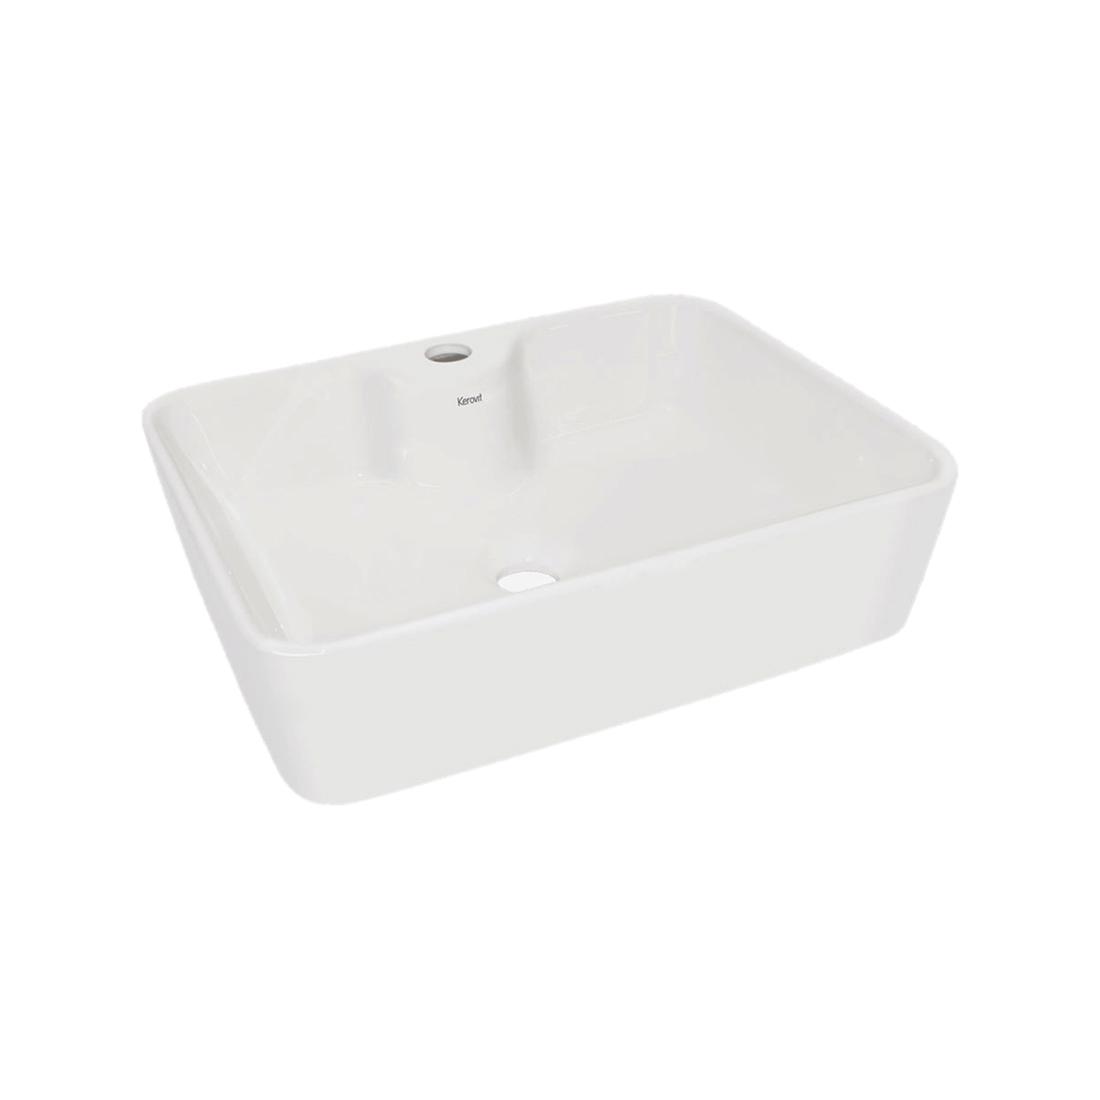 Kerovit Iris KS231 Counter Top Wash Basin